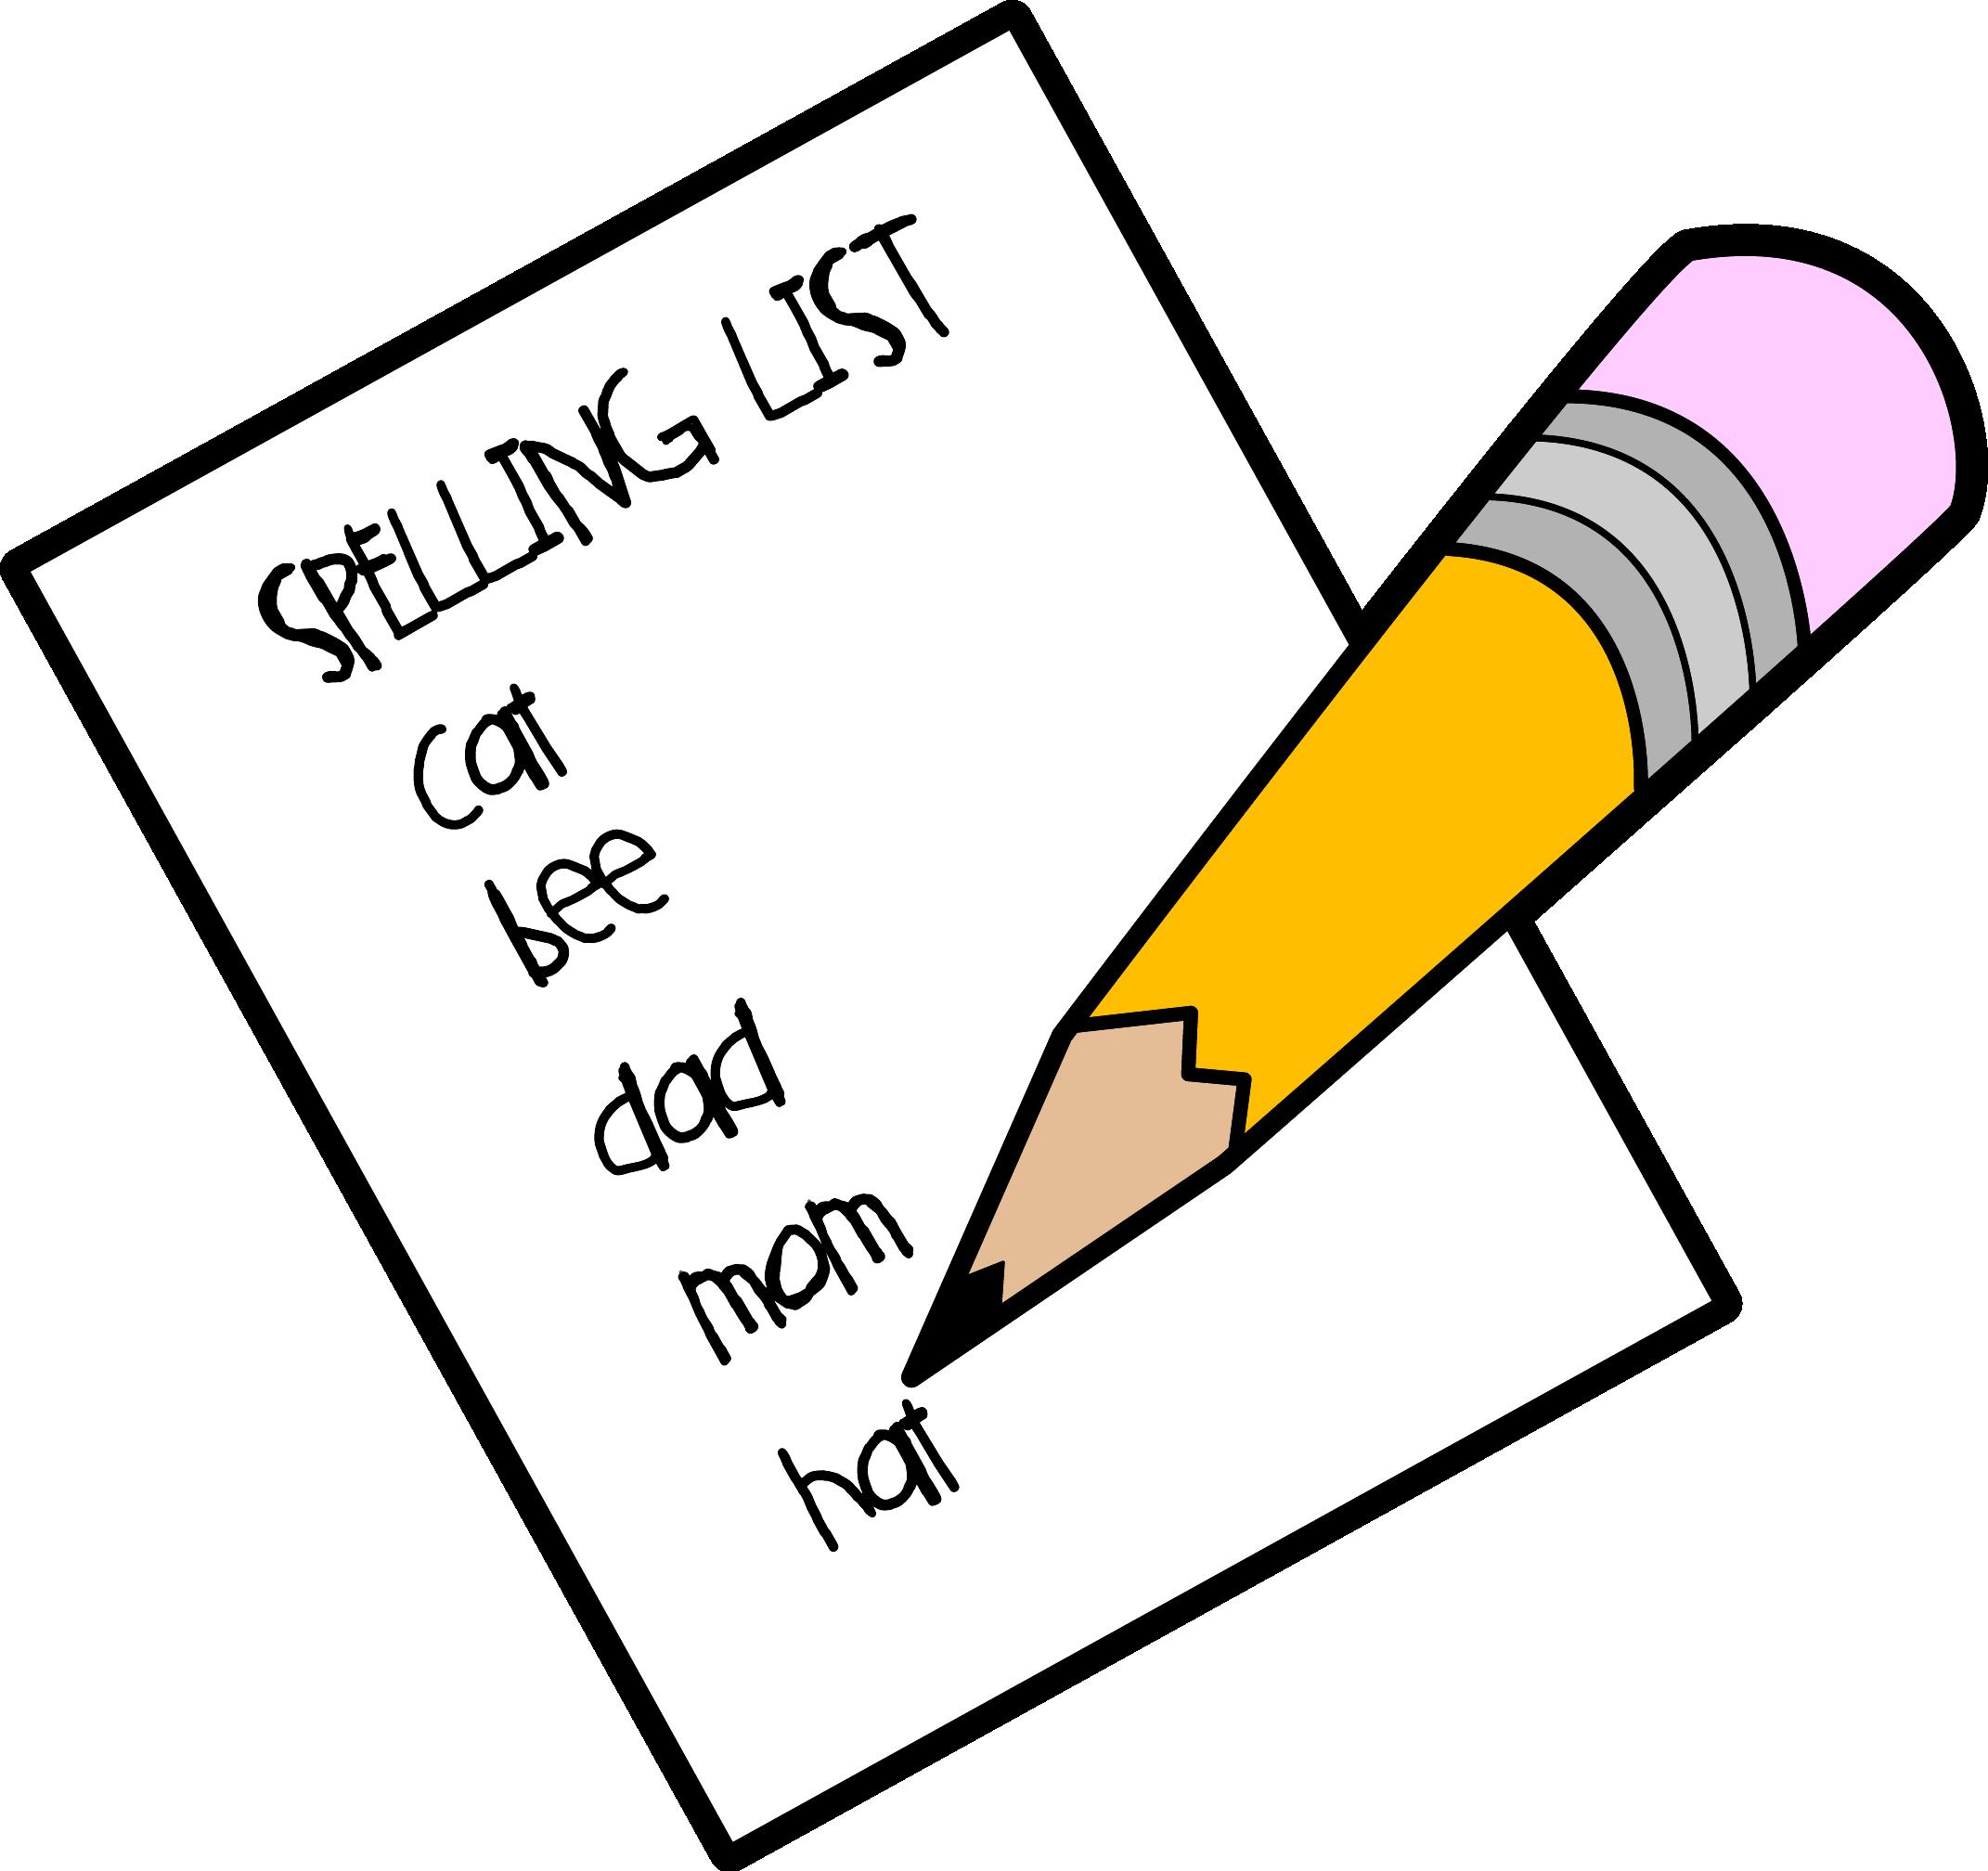 Spelling list clipart - ClipartFest banner library stock